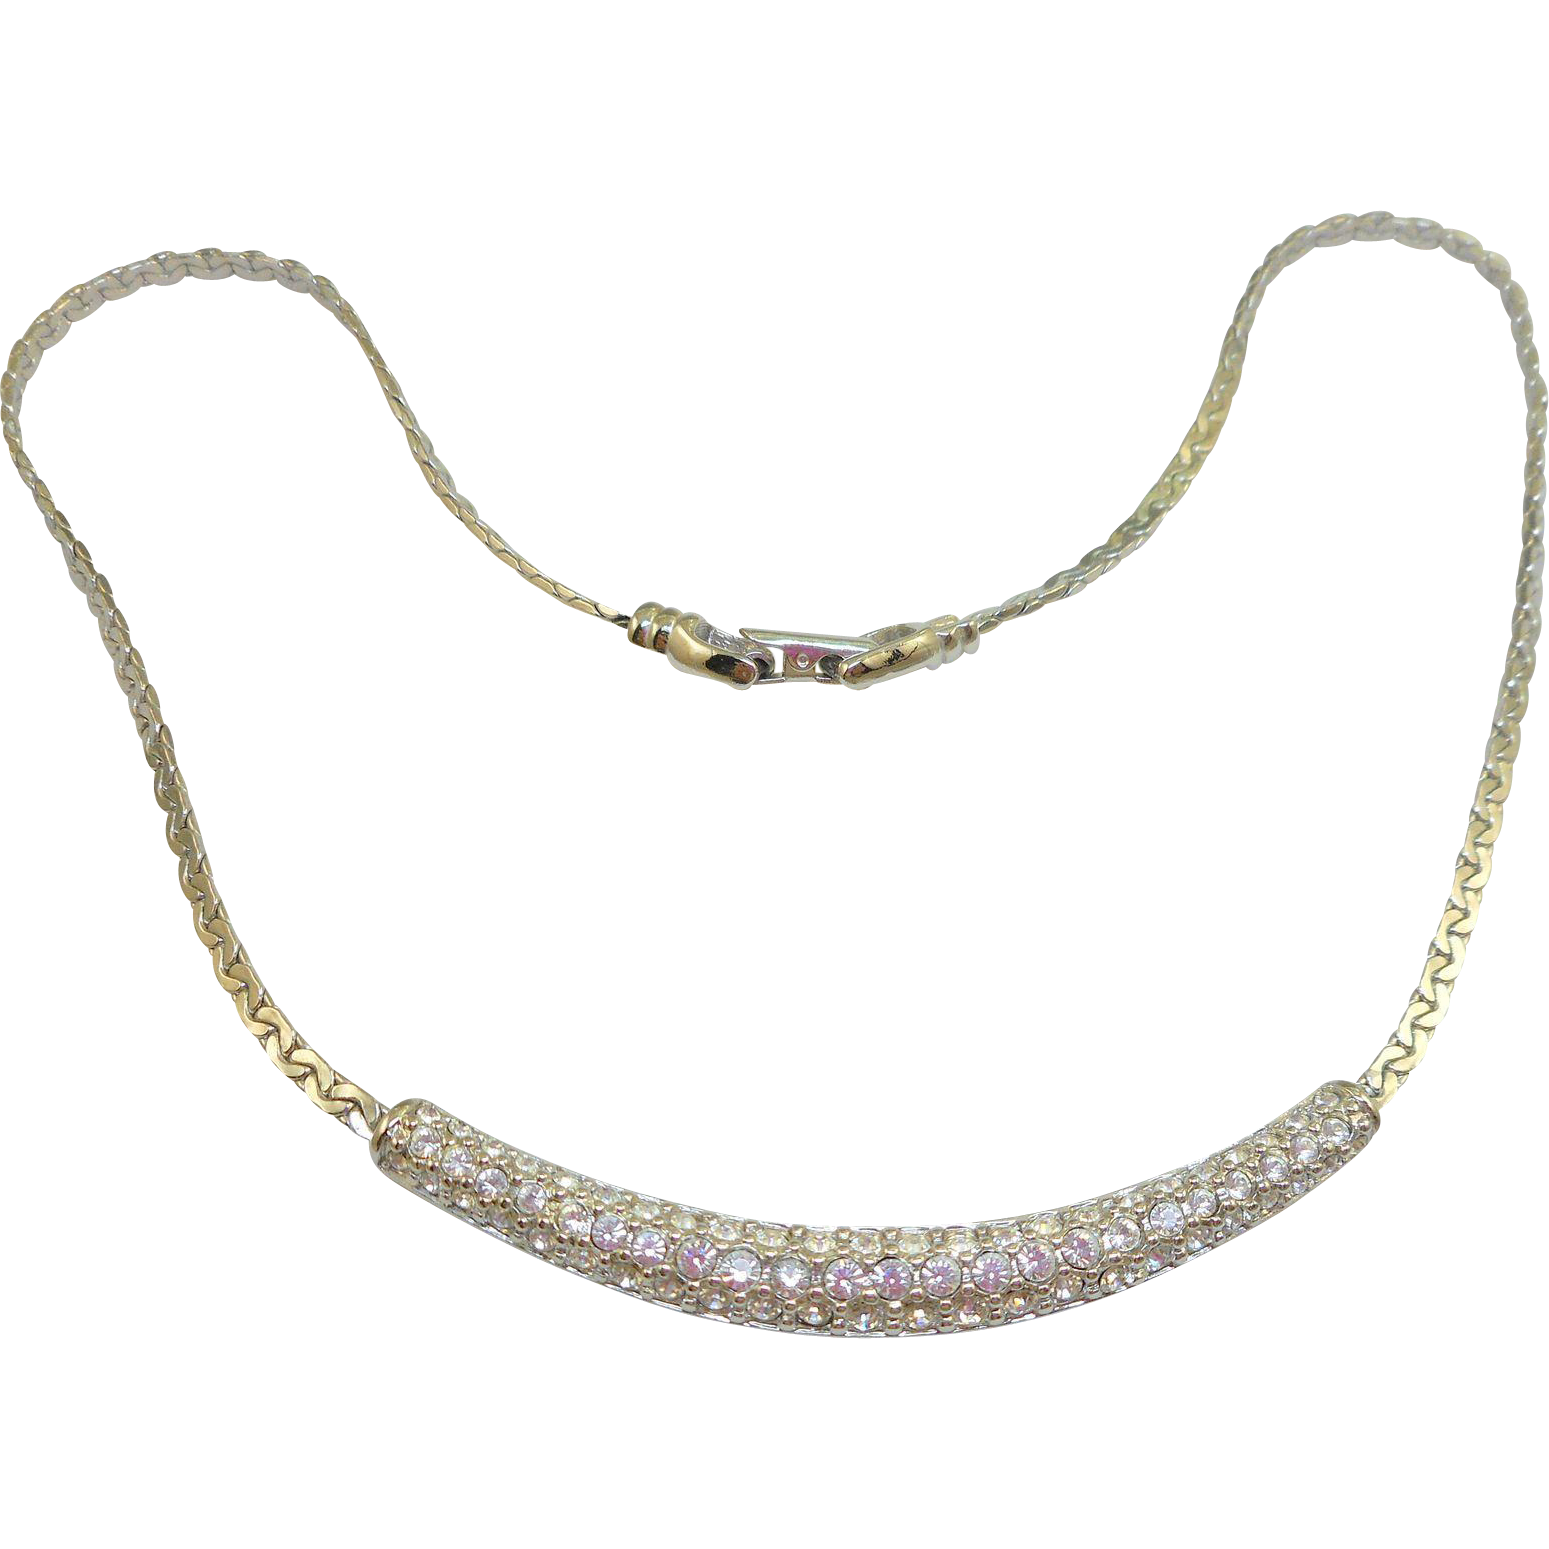 Sparkly Swarovski Necklace